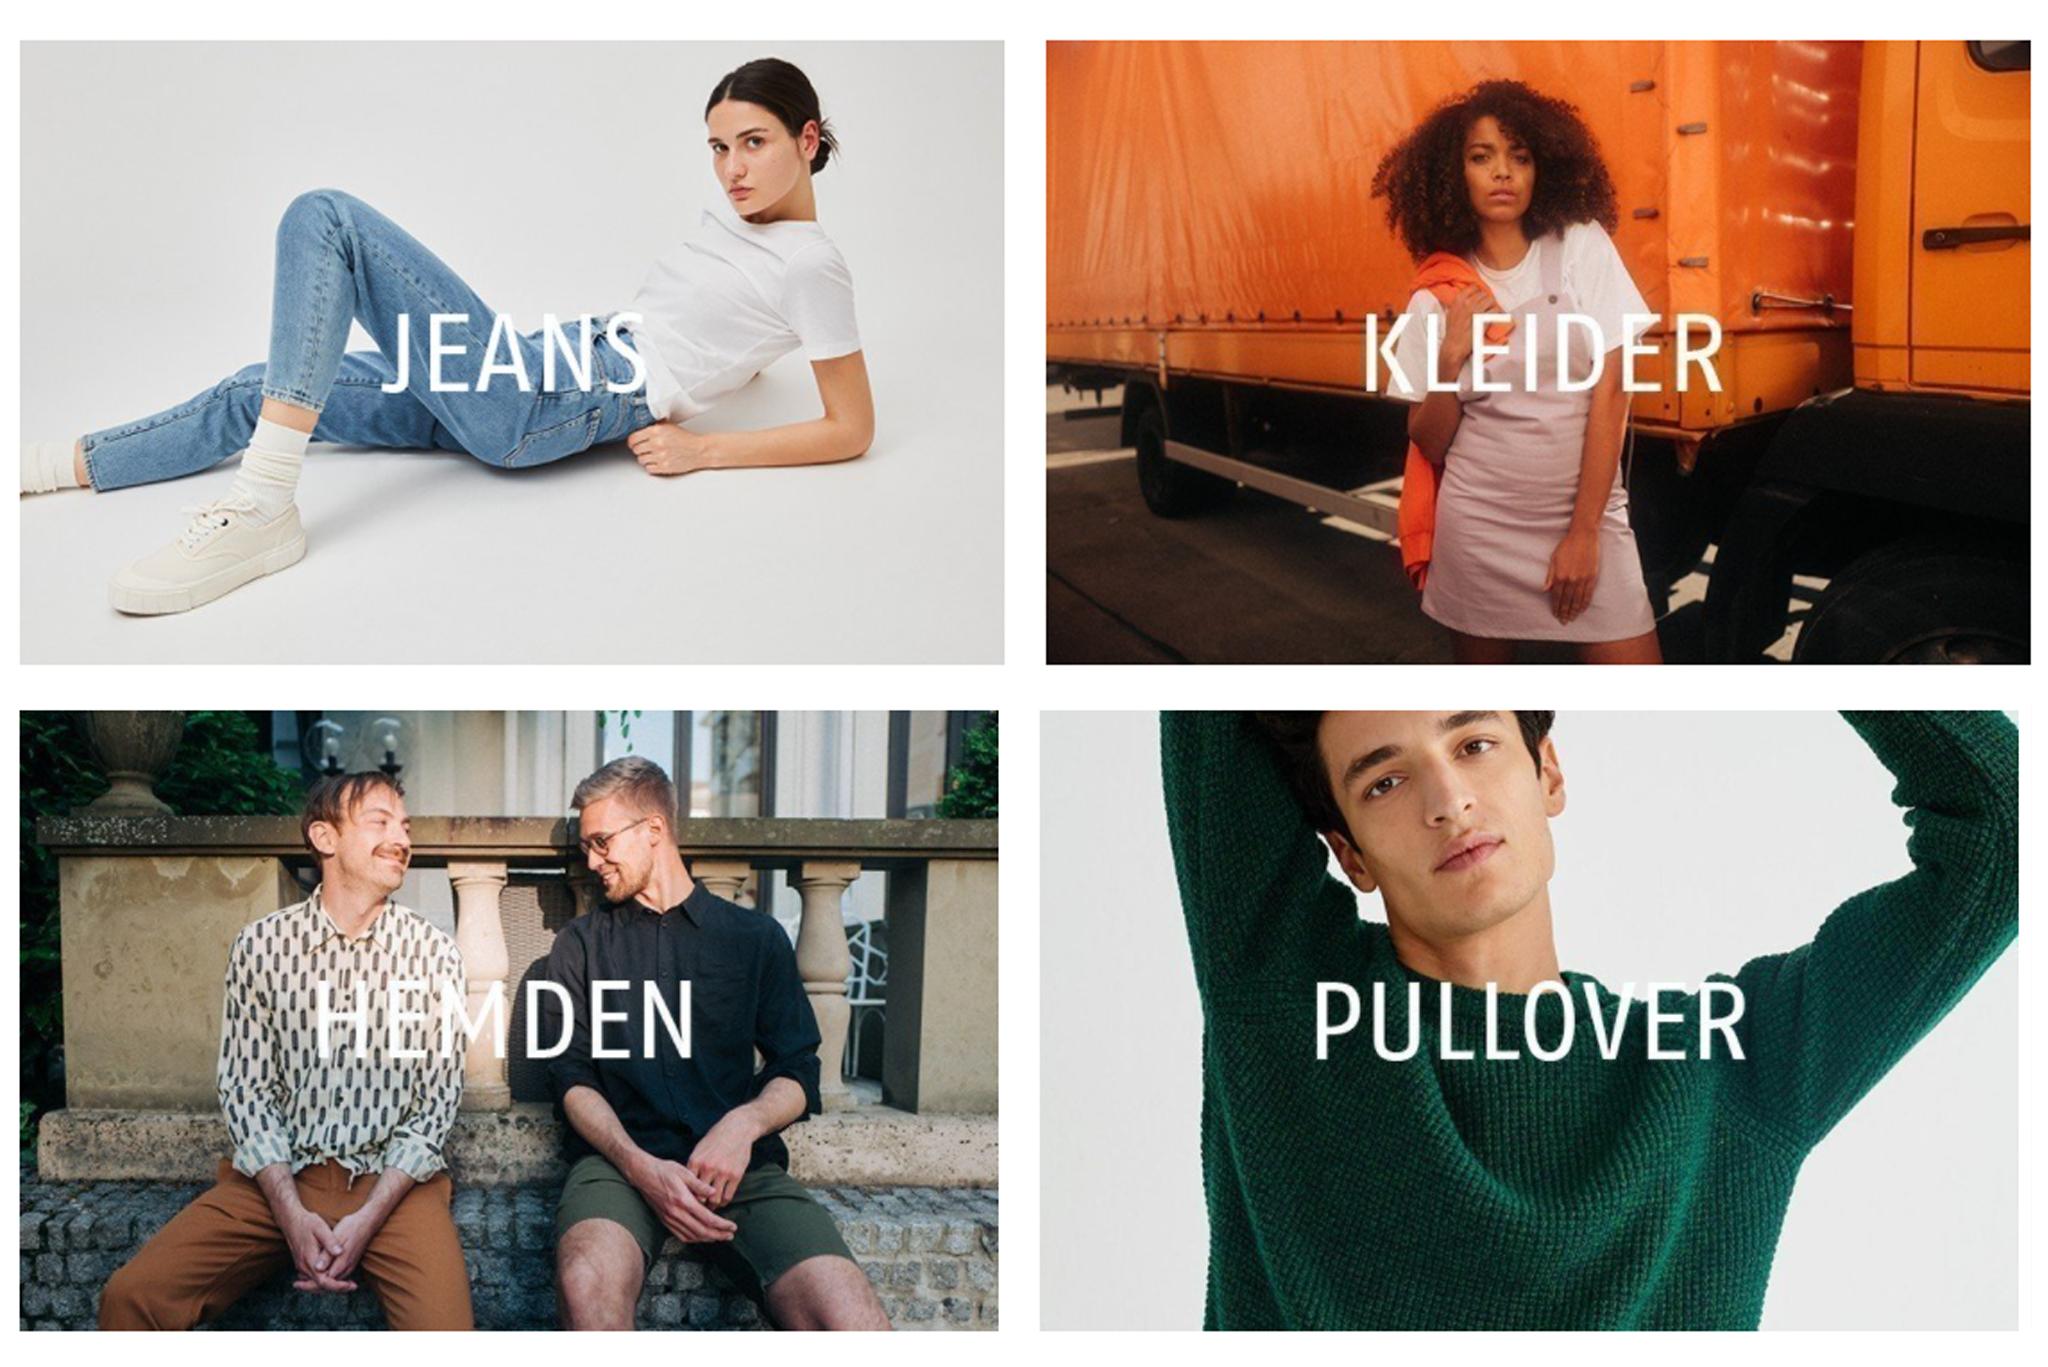 glore – globally responsible fashion.